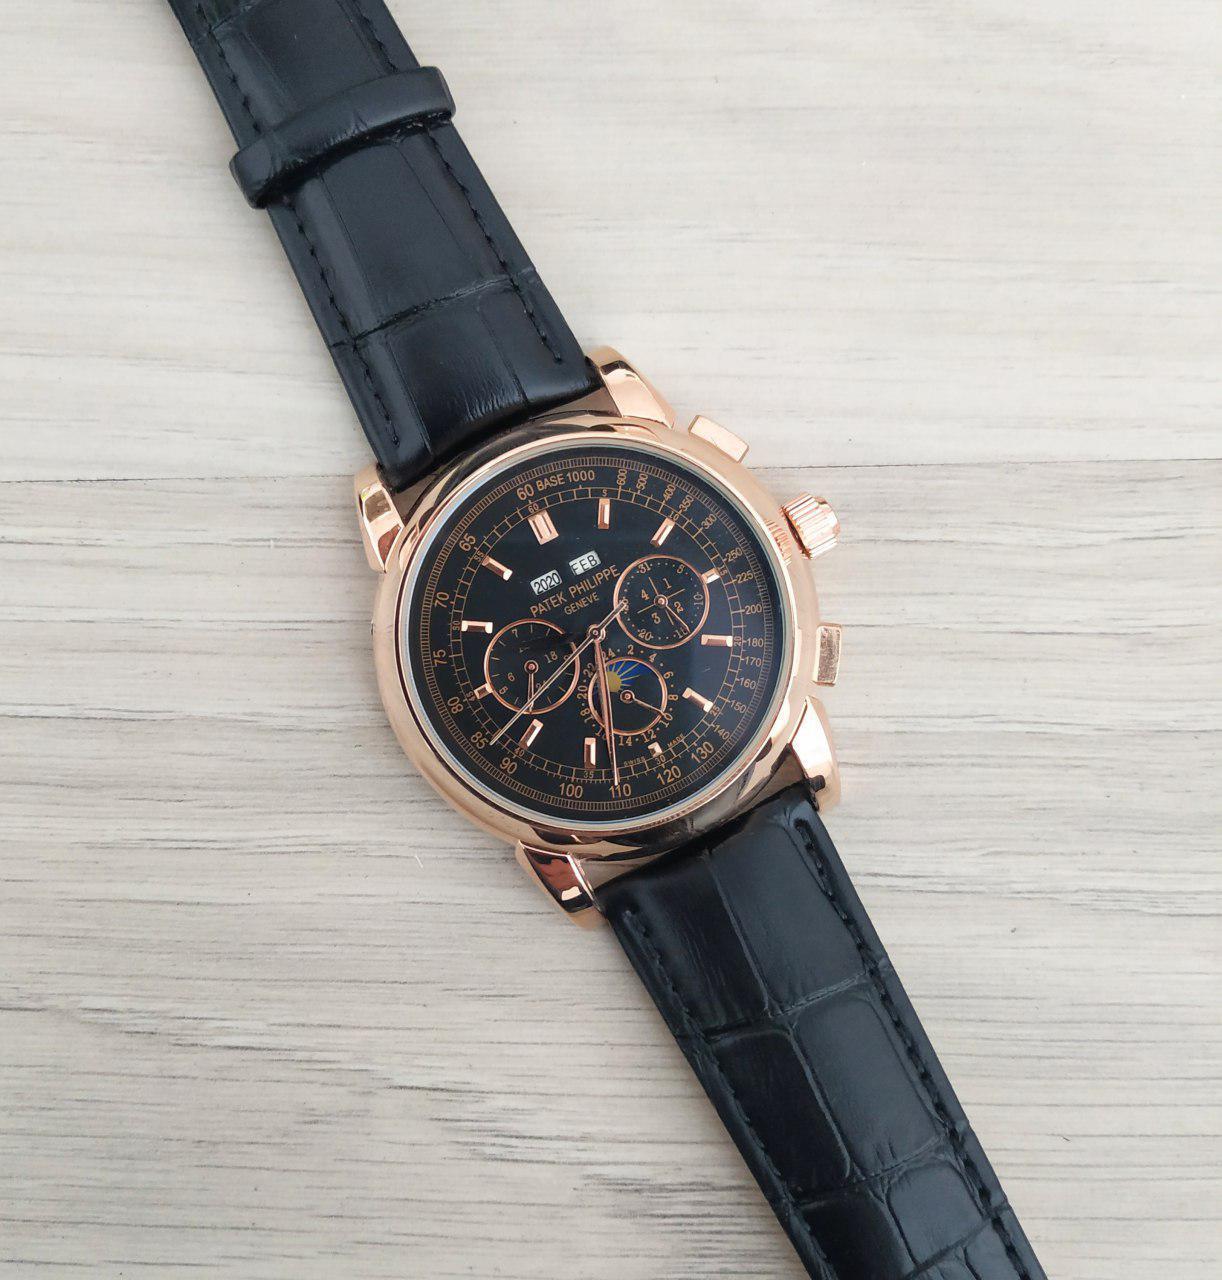 c664e7af Patek Philippe Grand Complications AA Alternative Black-Gold-Black мужские механические  часы - Choice